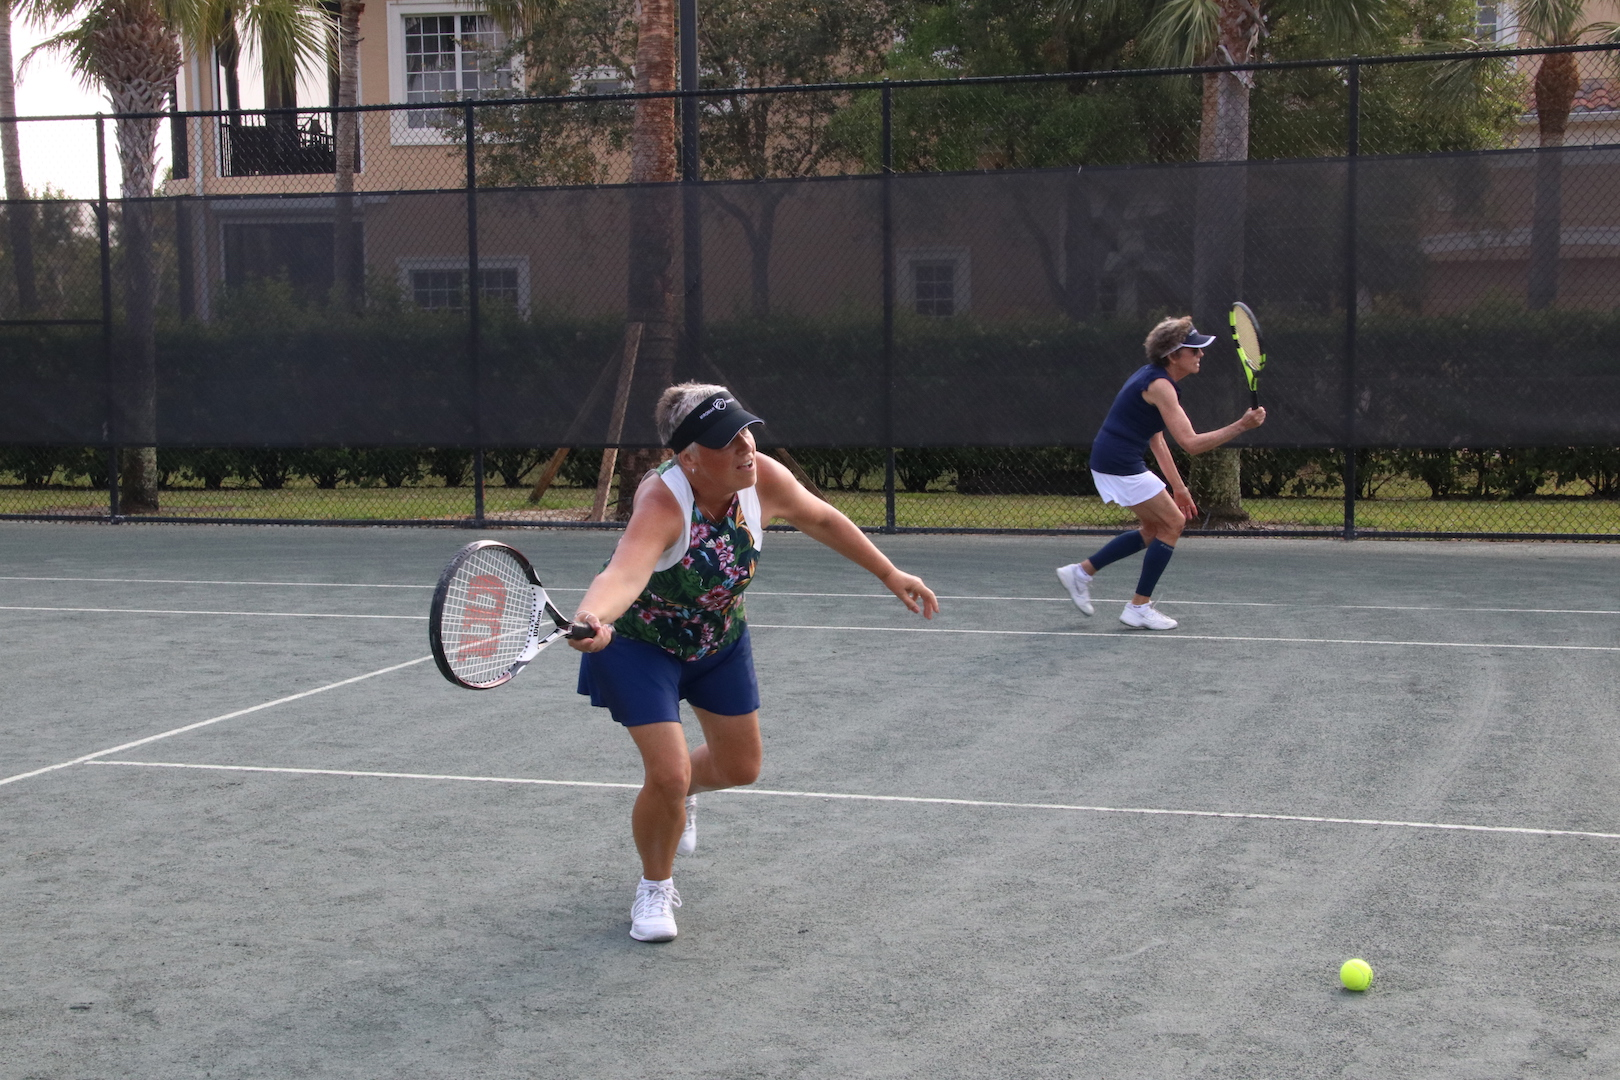 tennis-Amystephens.JPG